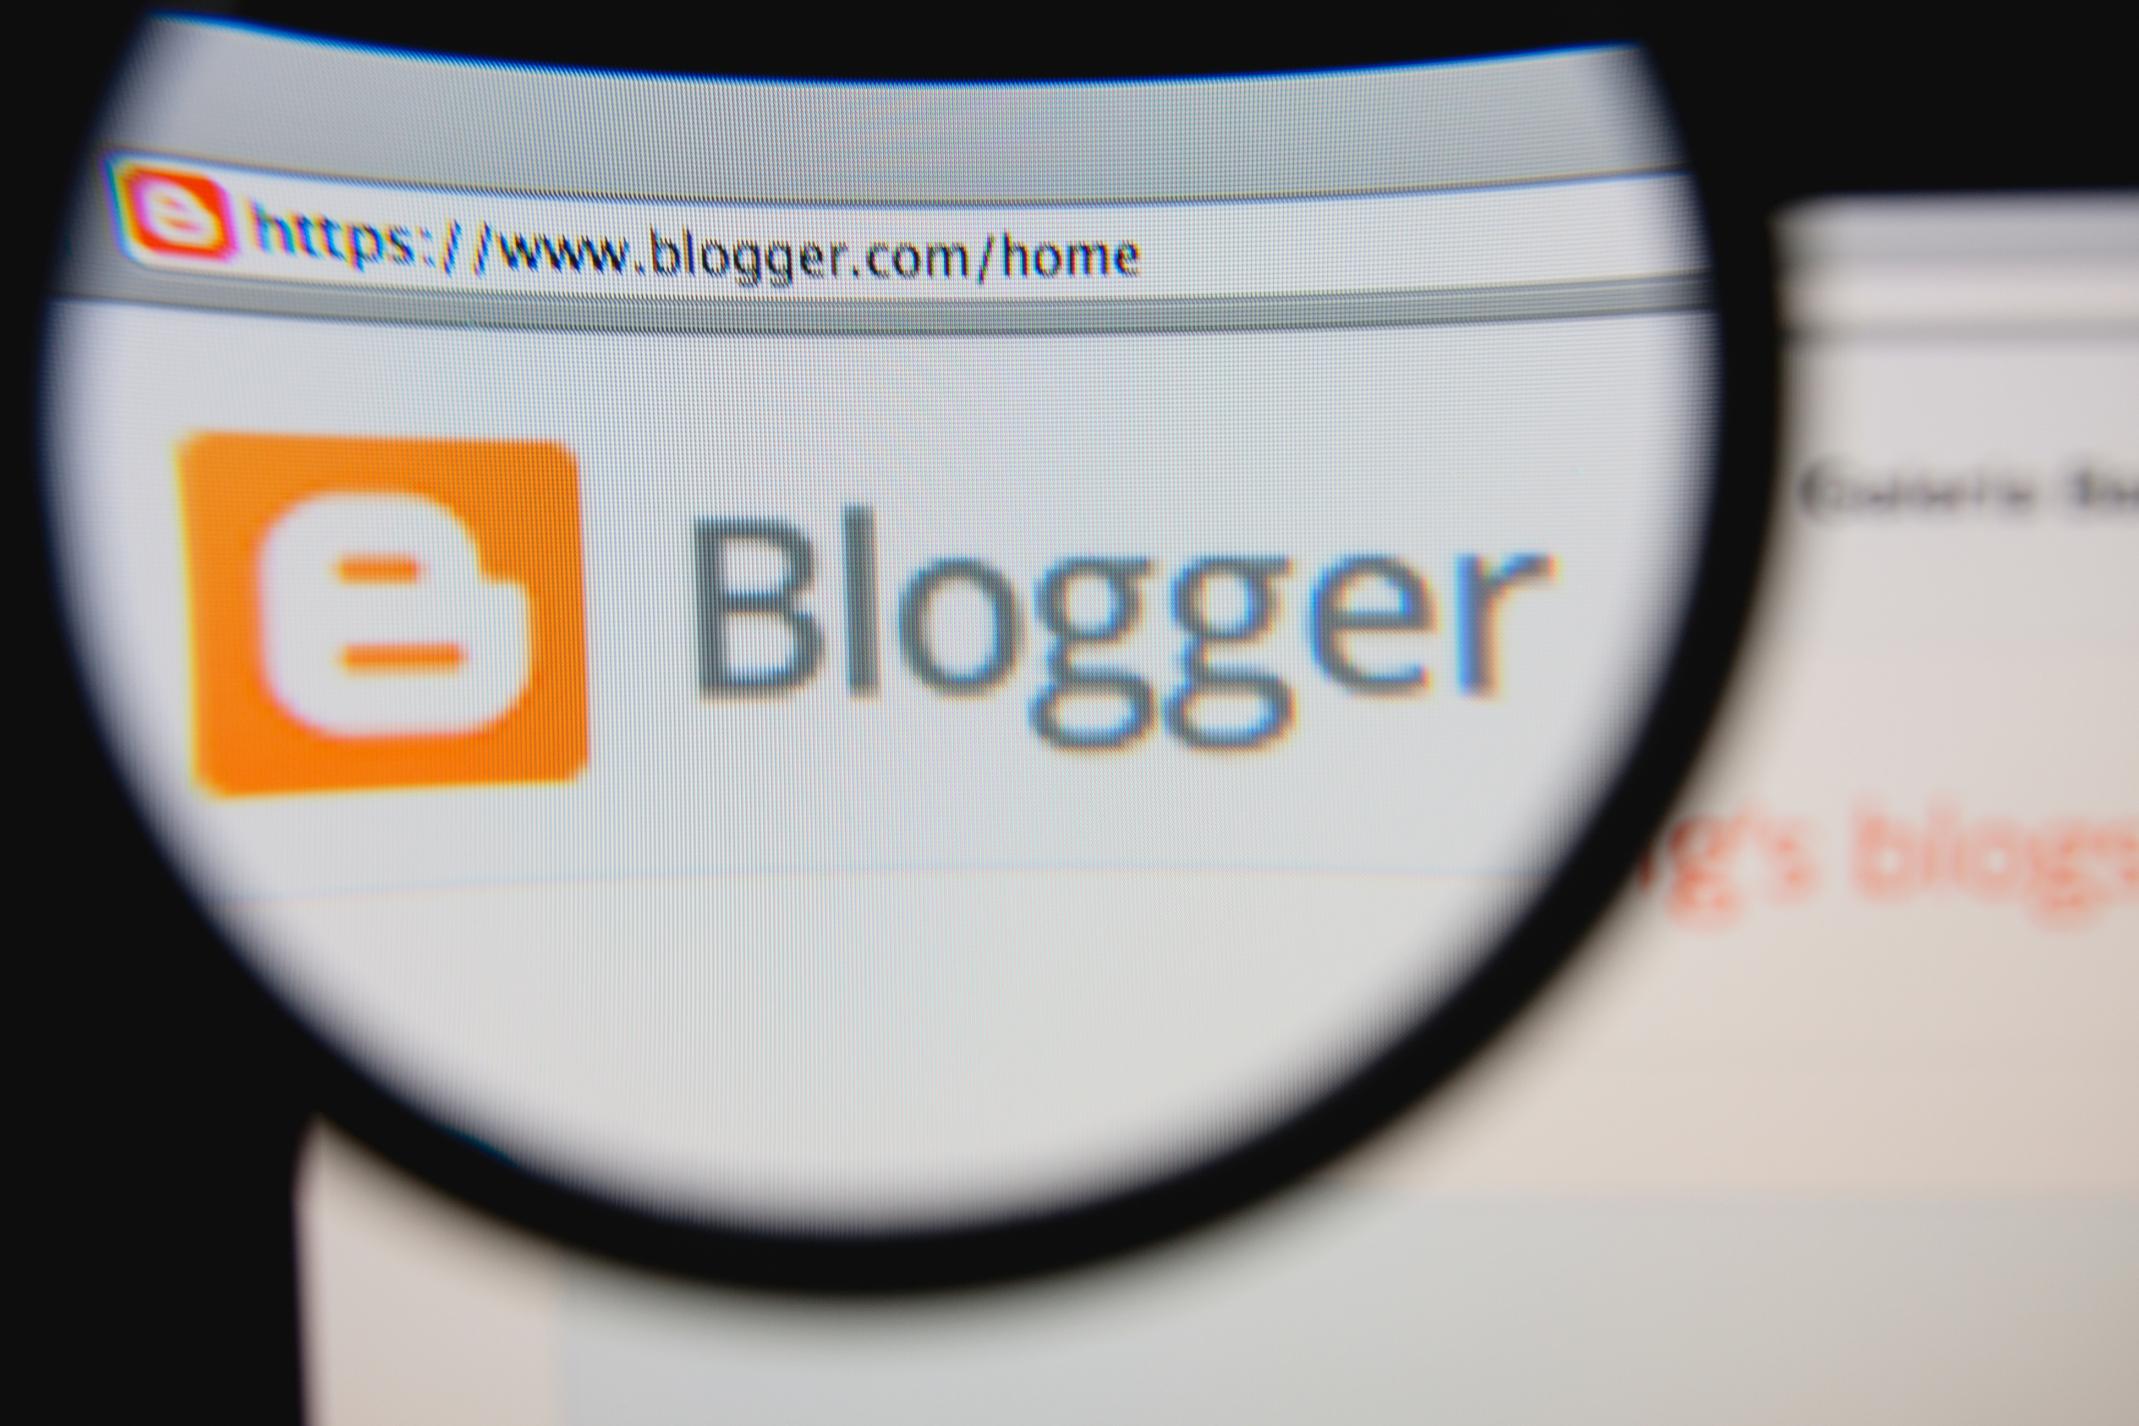 blogger-google-como-crear-tu-propio-blog-portal-luna-de-miel